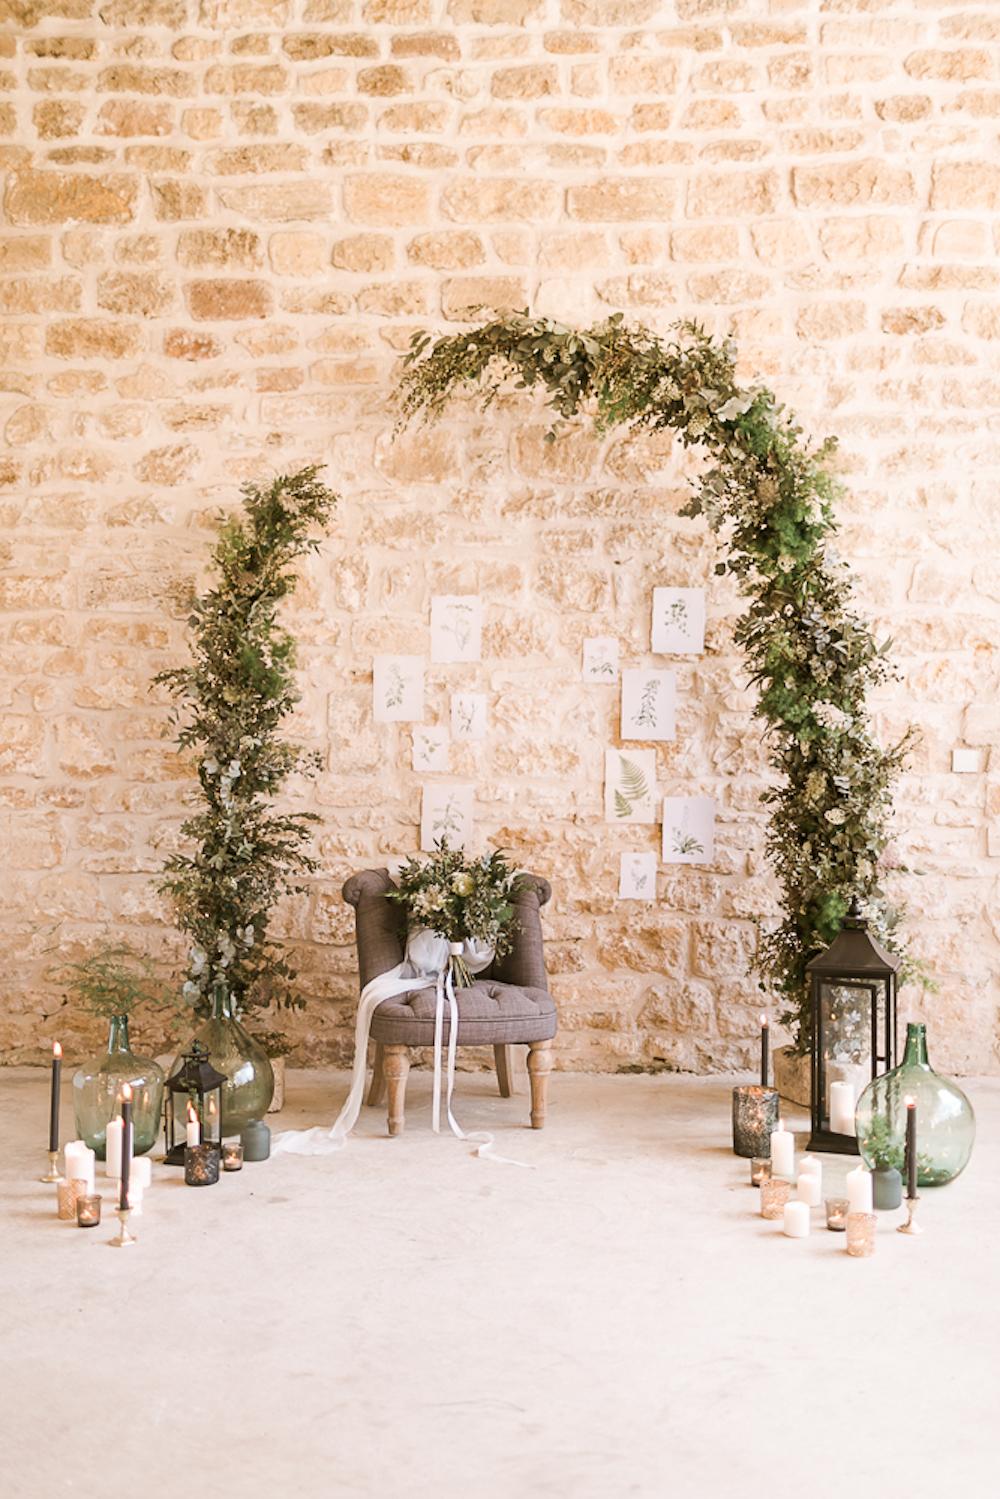 parisian-inspired-blog-mariage-shooting-inspiration-vegetal-abbaye-trois-fontaines-marne-cg-photographie-1.jpg